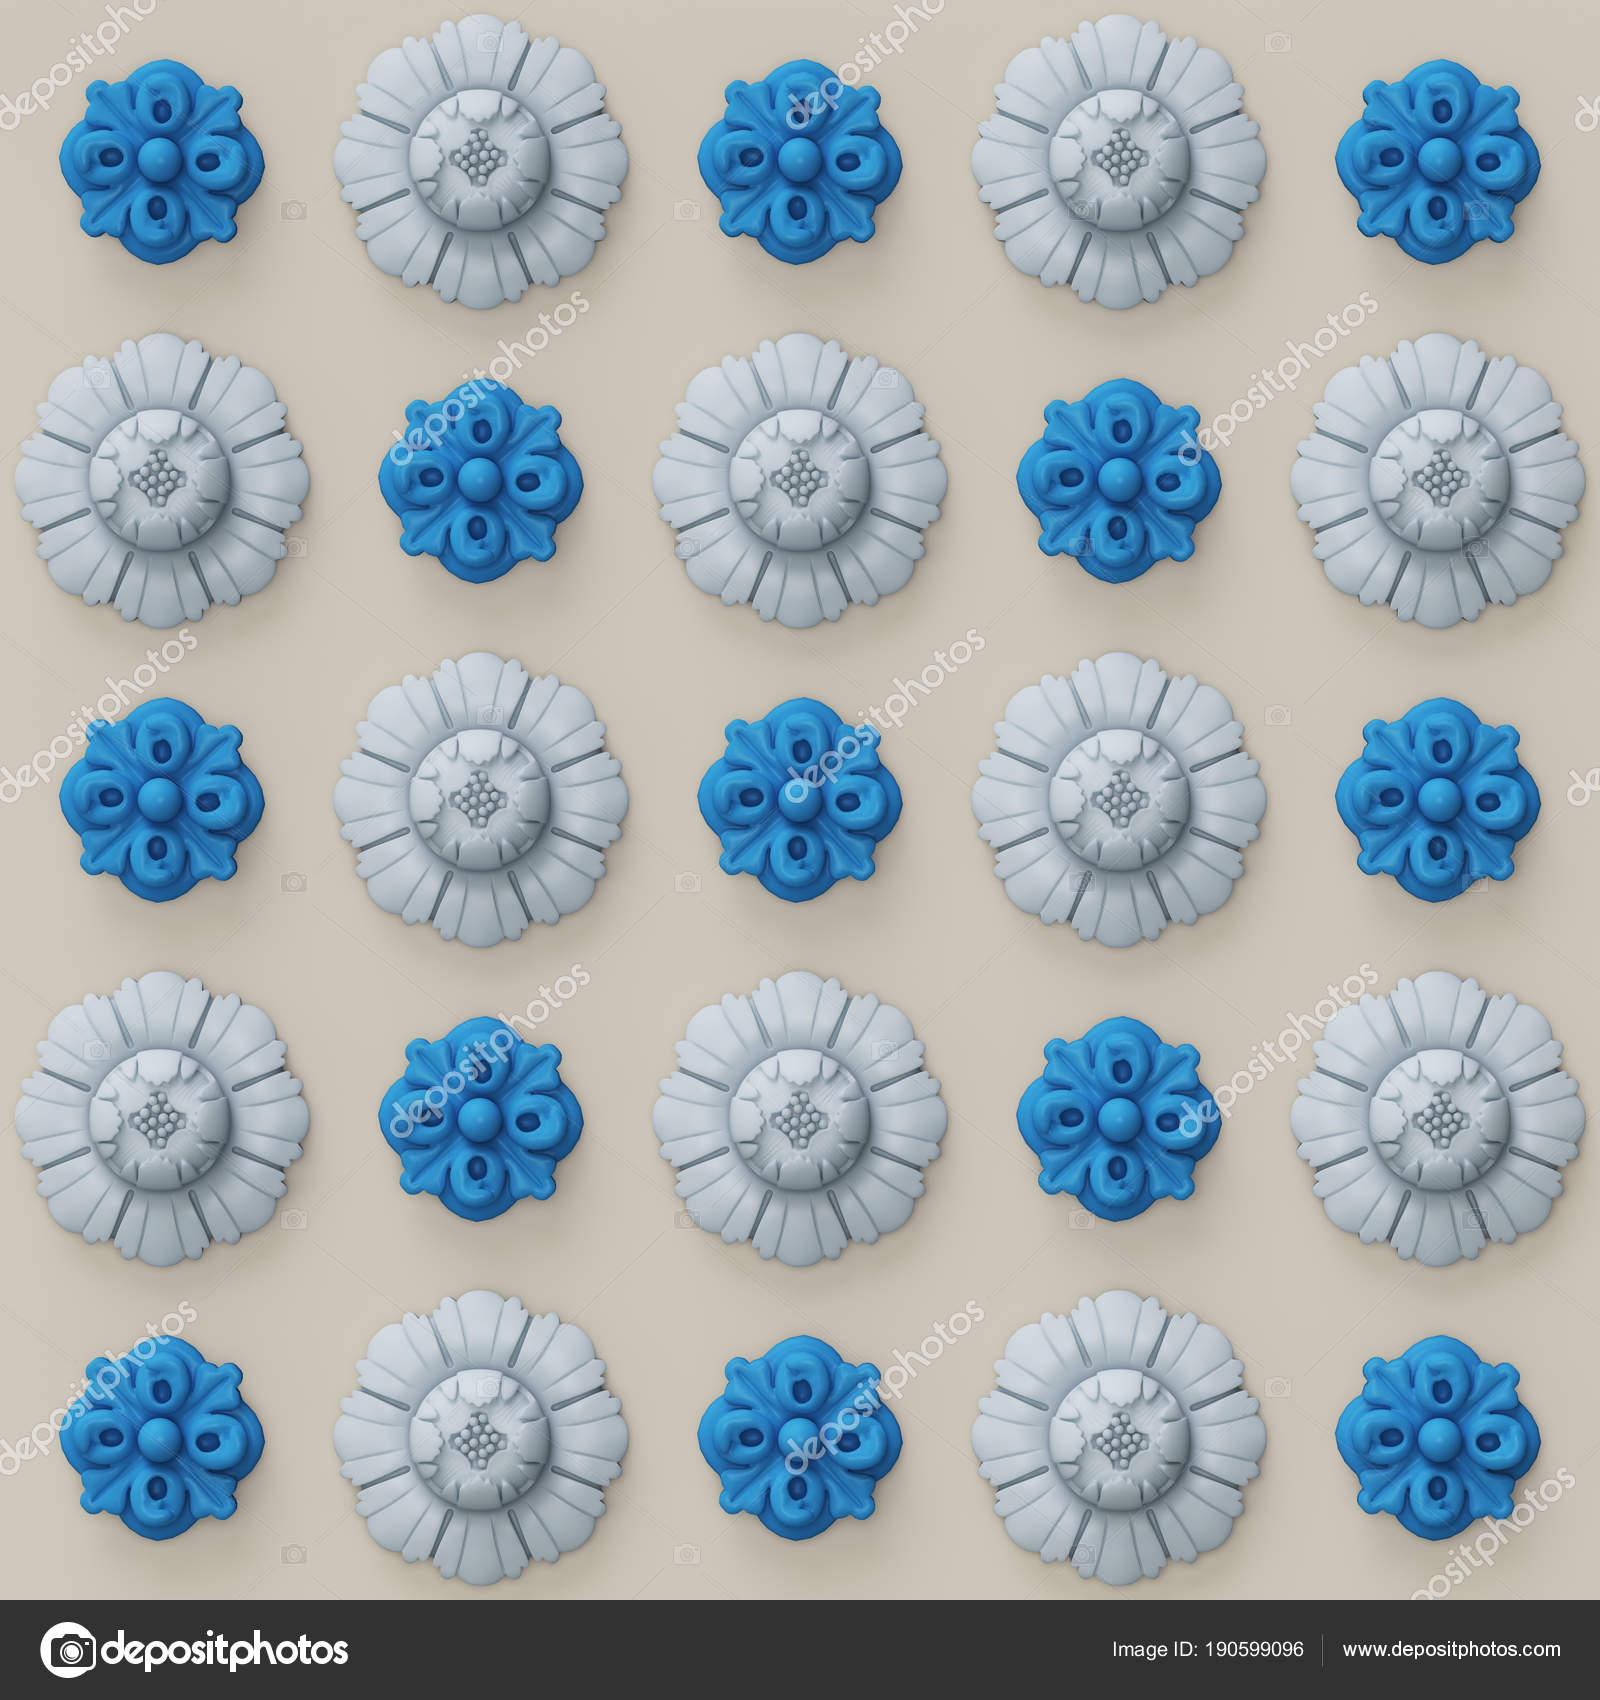 Render digital illustration blue light blue flowers gray warm 3d render digital illustrationblue and light blue flowers on gray warm backgroundpattern photo by remuhin izmirmasajfo